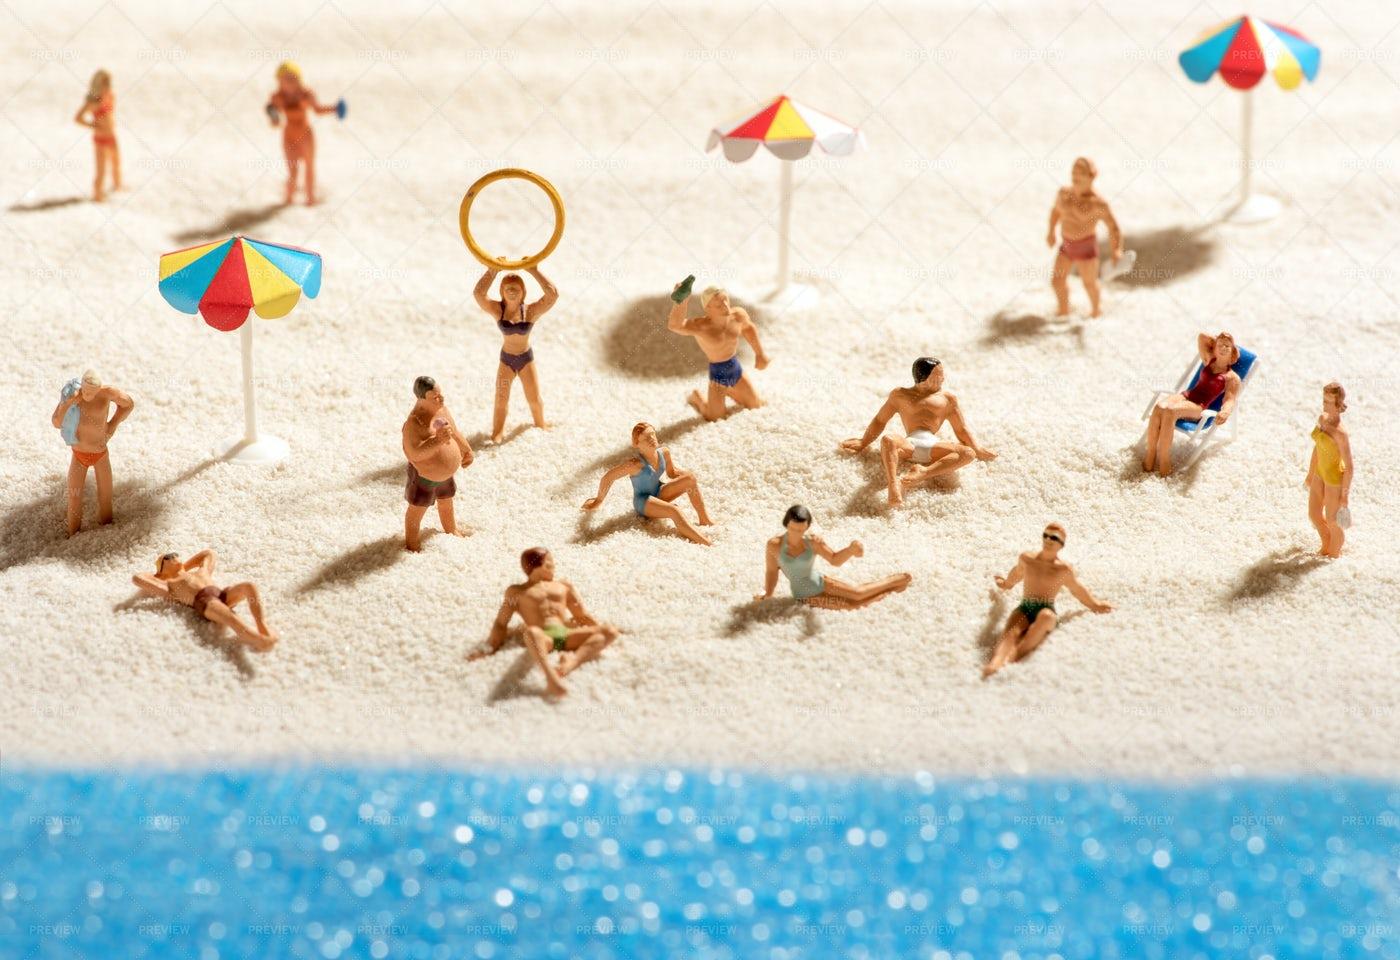 Miniature People Sunbathing: Stock Photos